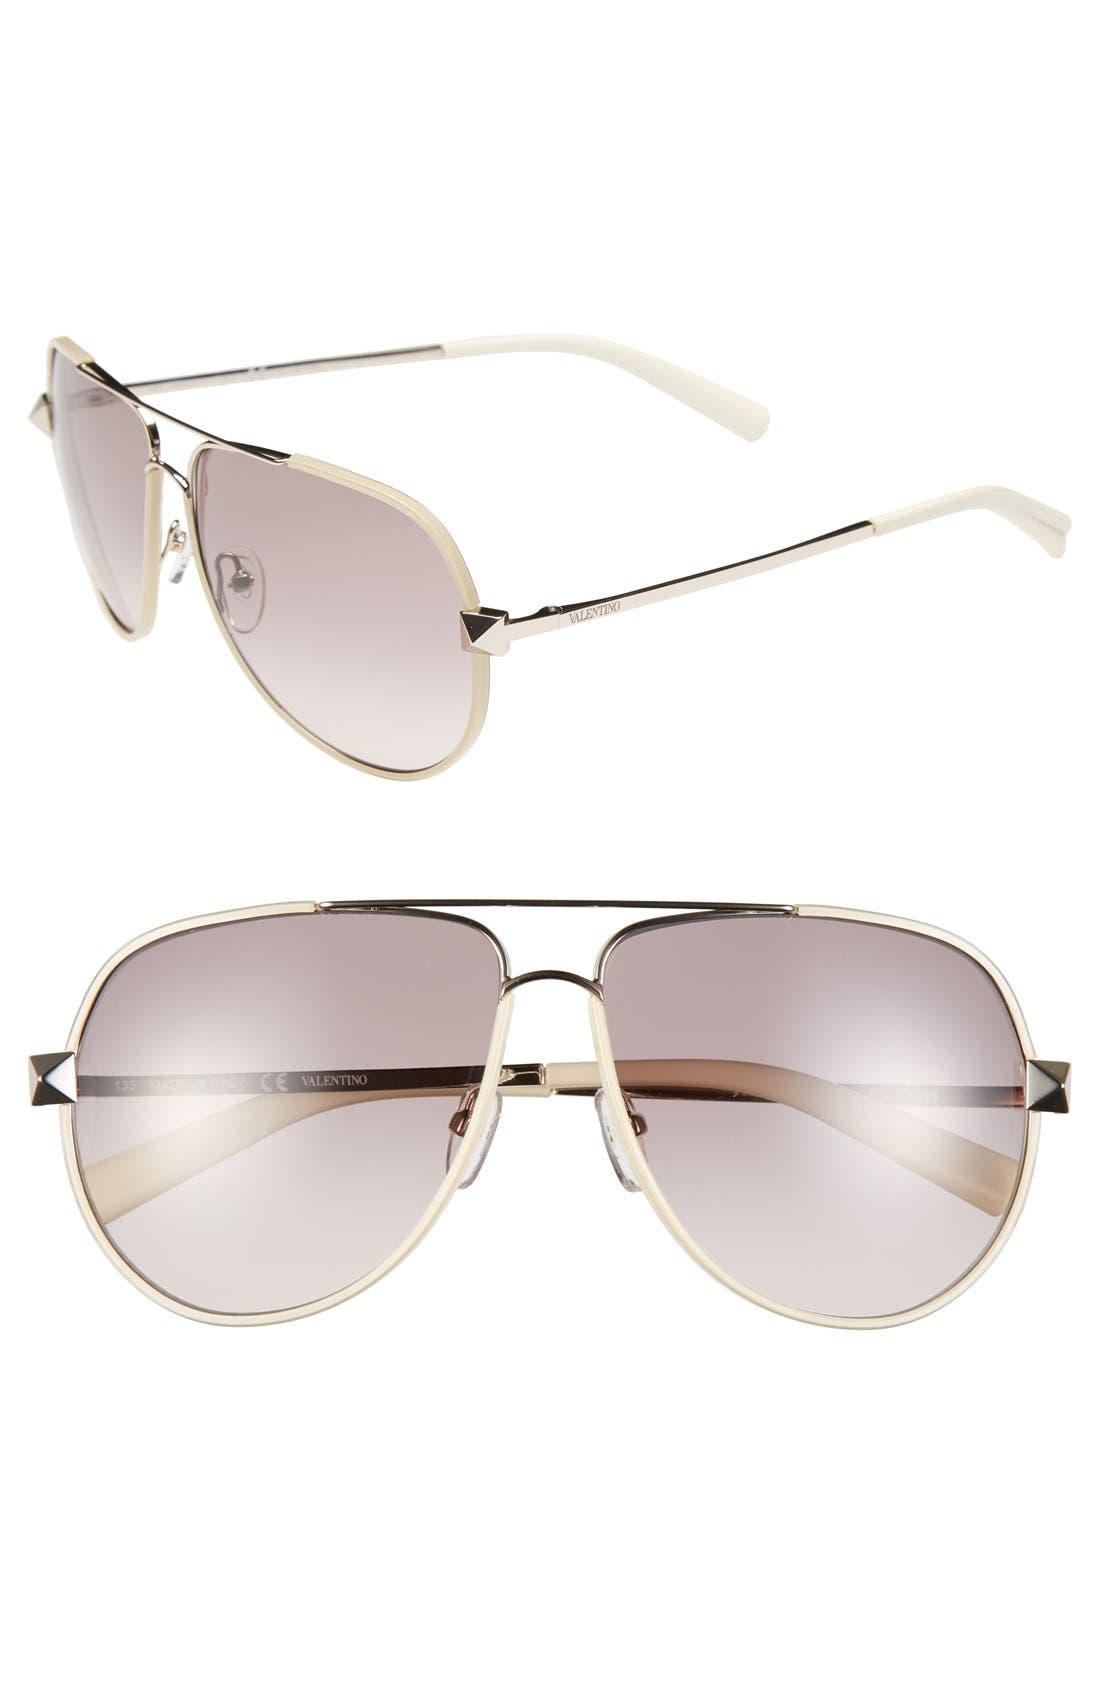 Main Image - Valentino 'Rockstud' 60mm Aviator Sunglasses